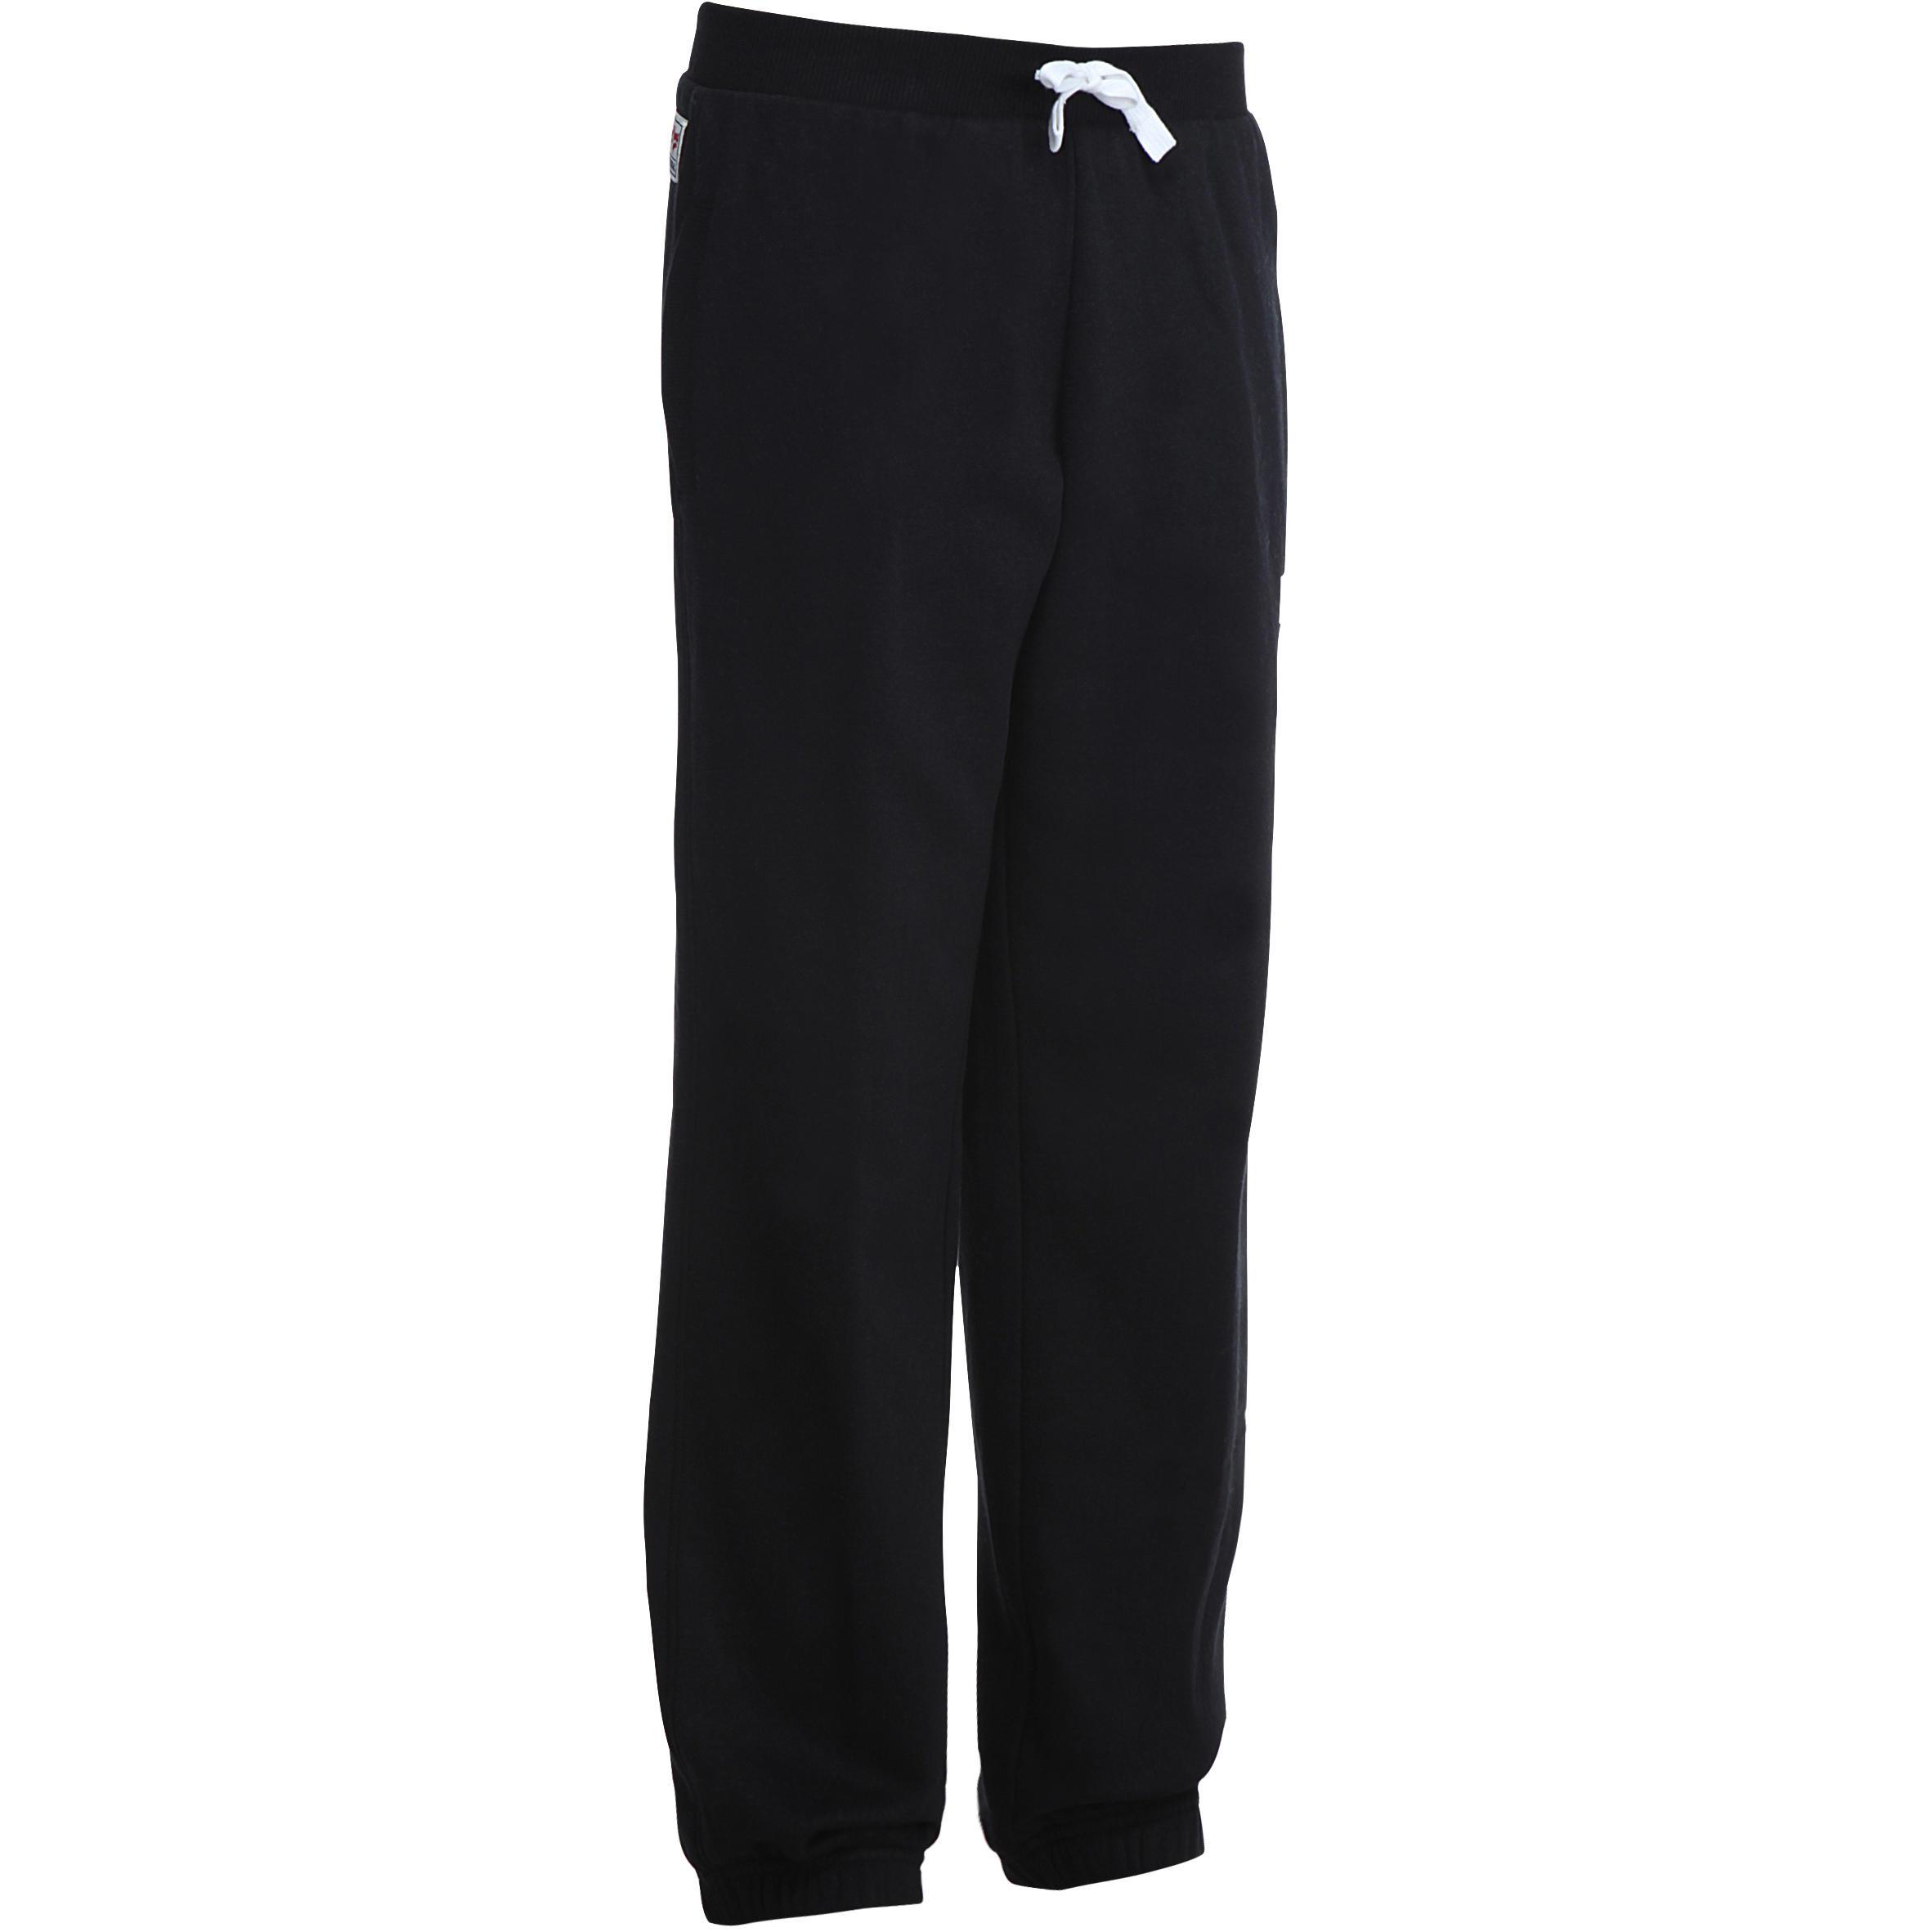 Pantalón de felpa gimnasia niño negro